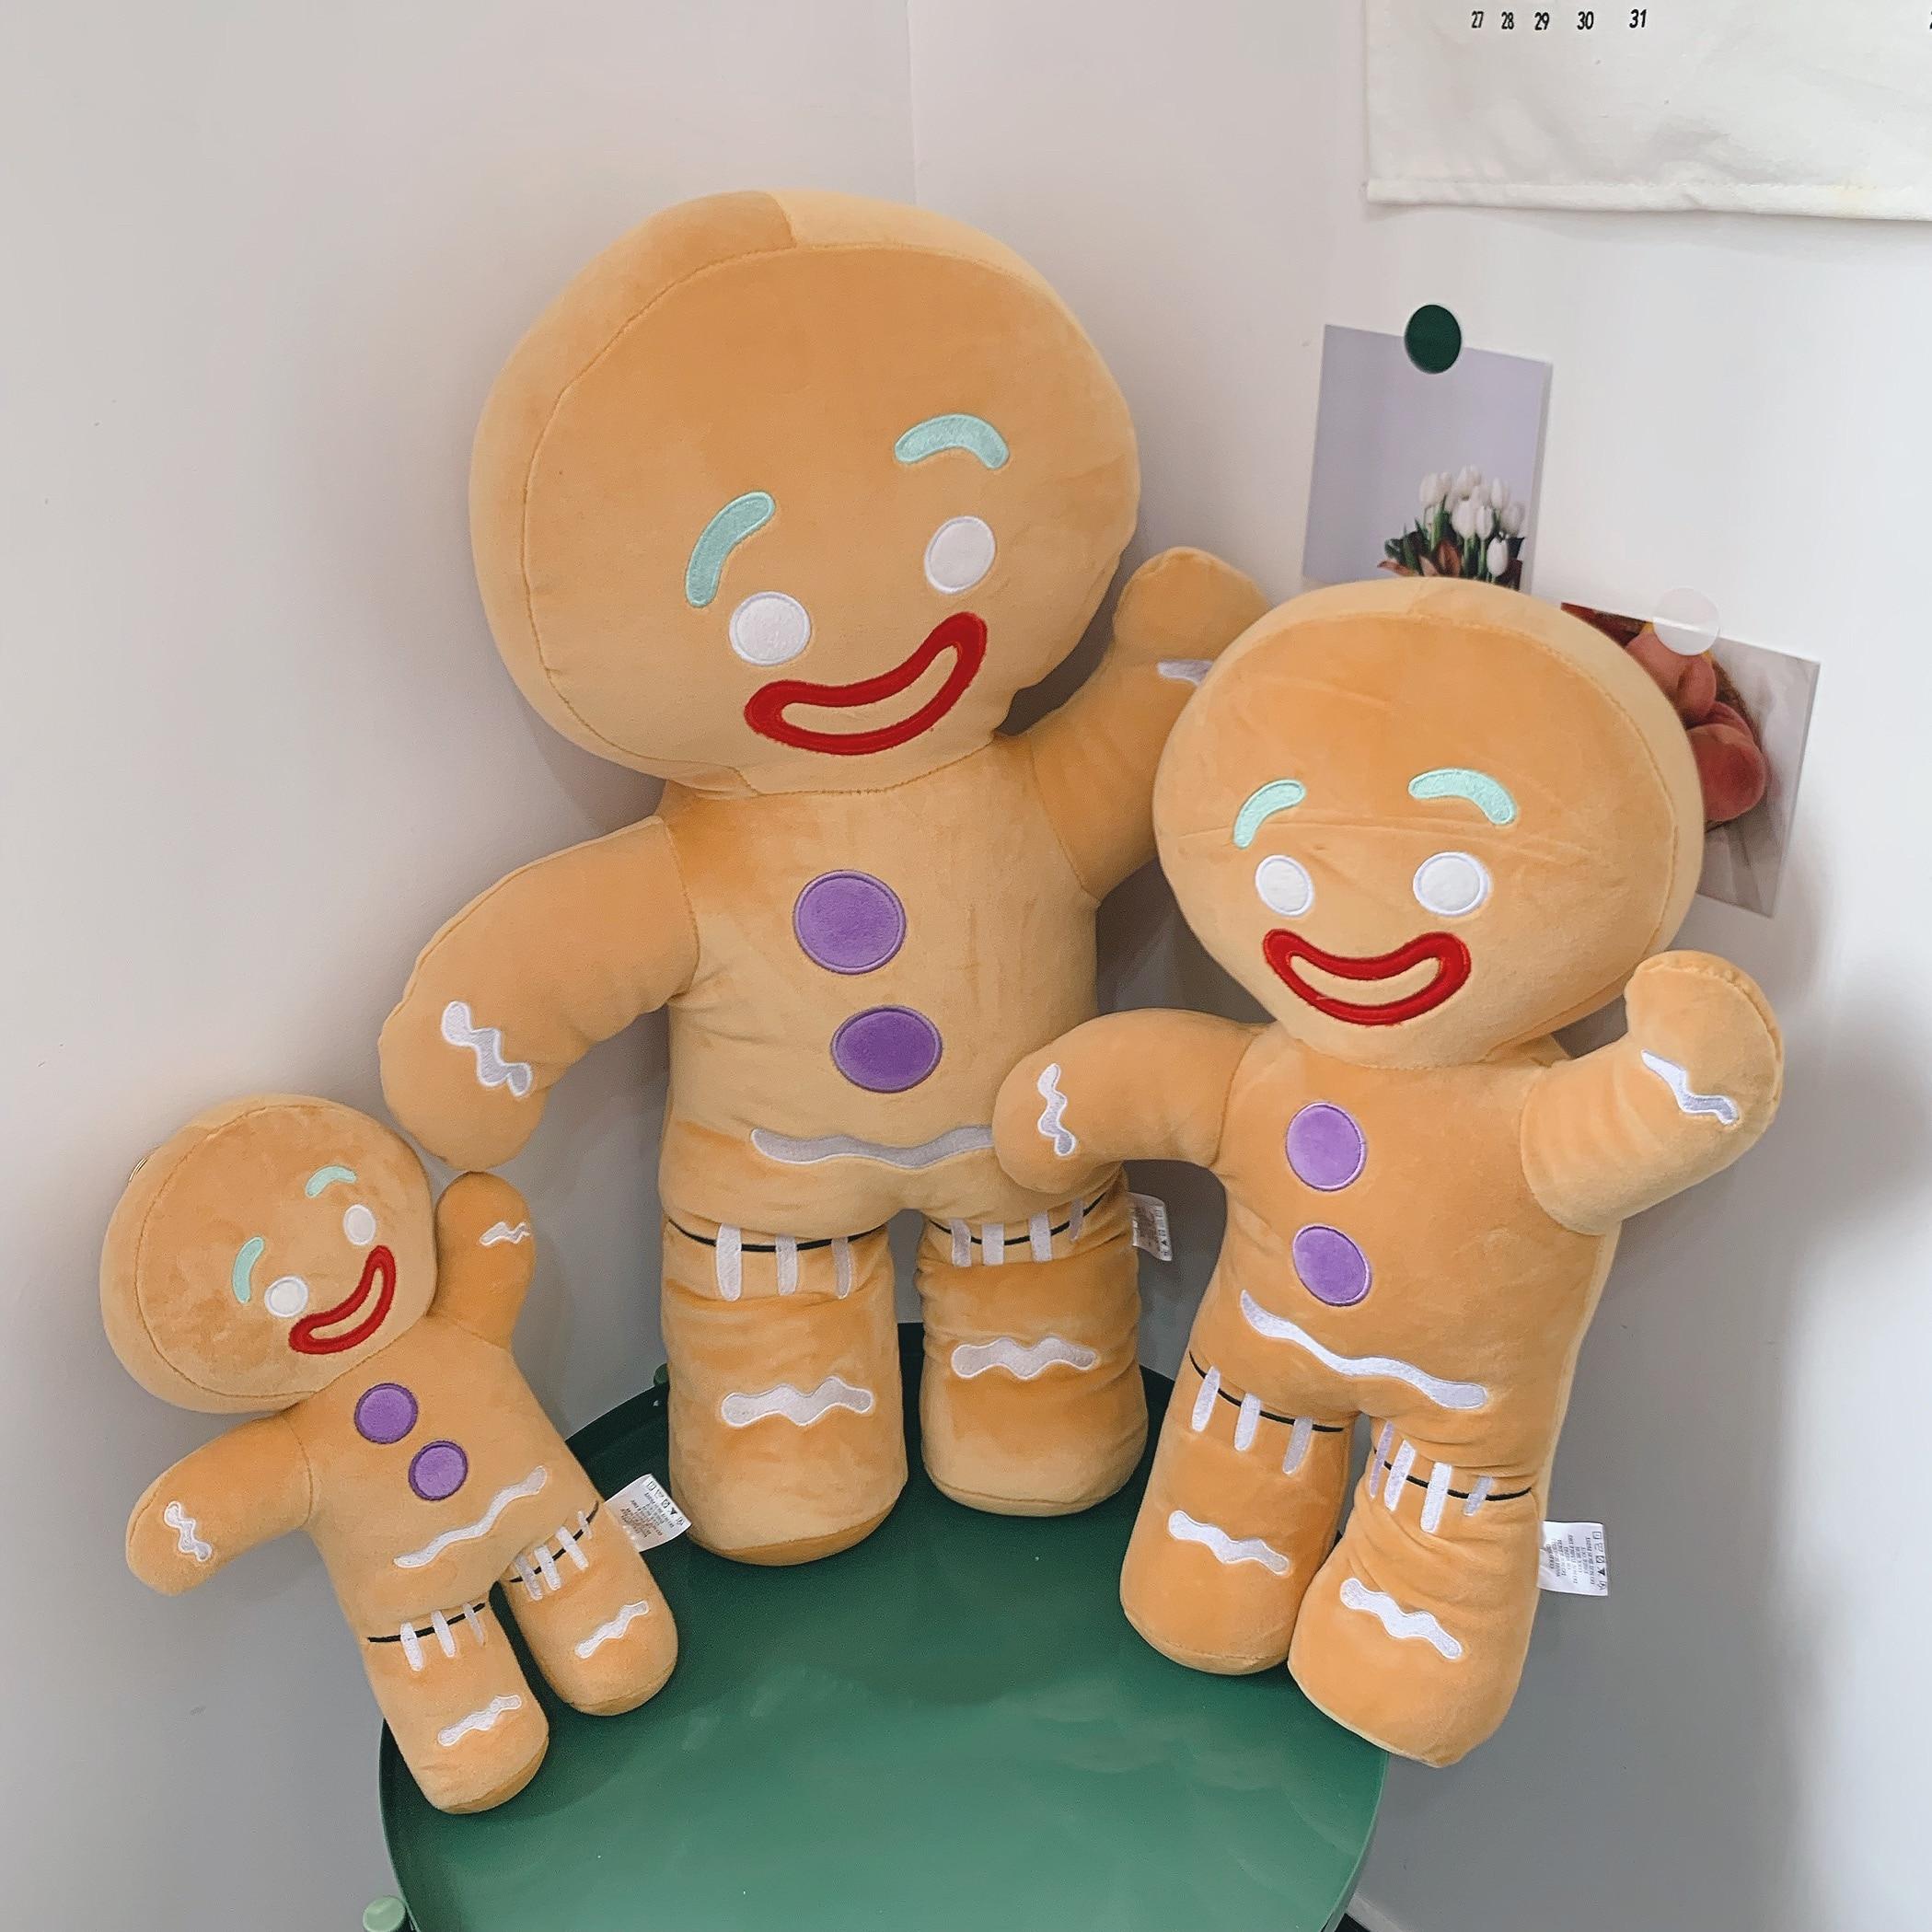 Kawaii Shrek Gingerbread Man Bigheadz Doll Stuffed Plush Toys Soft Sofa Cushion Pillow Dolls Childrens Gift birthday present